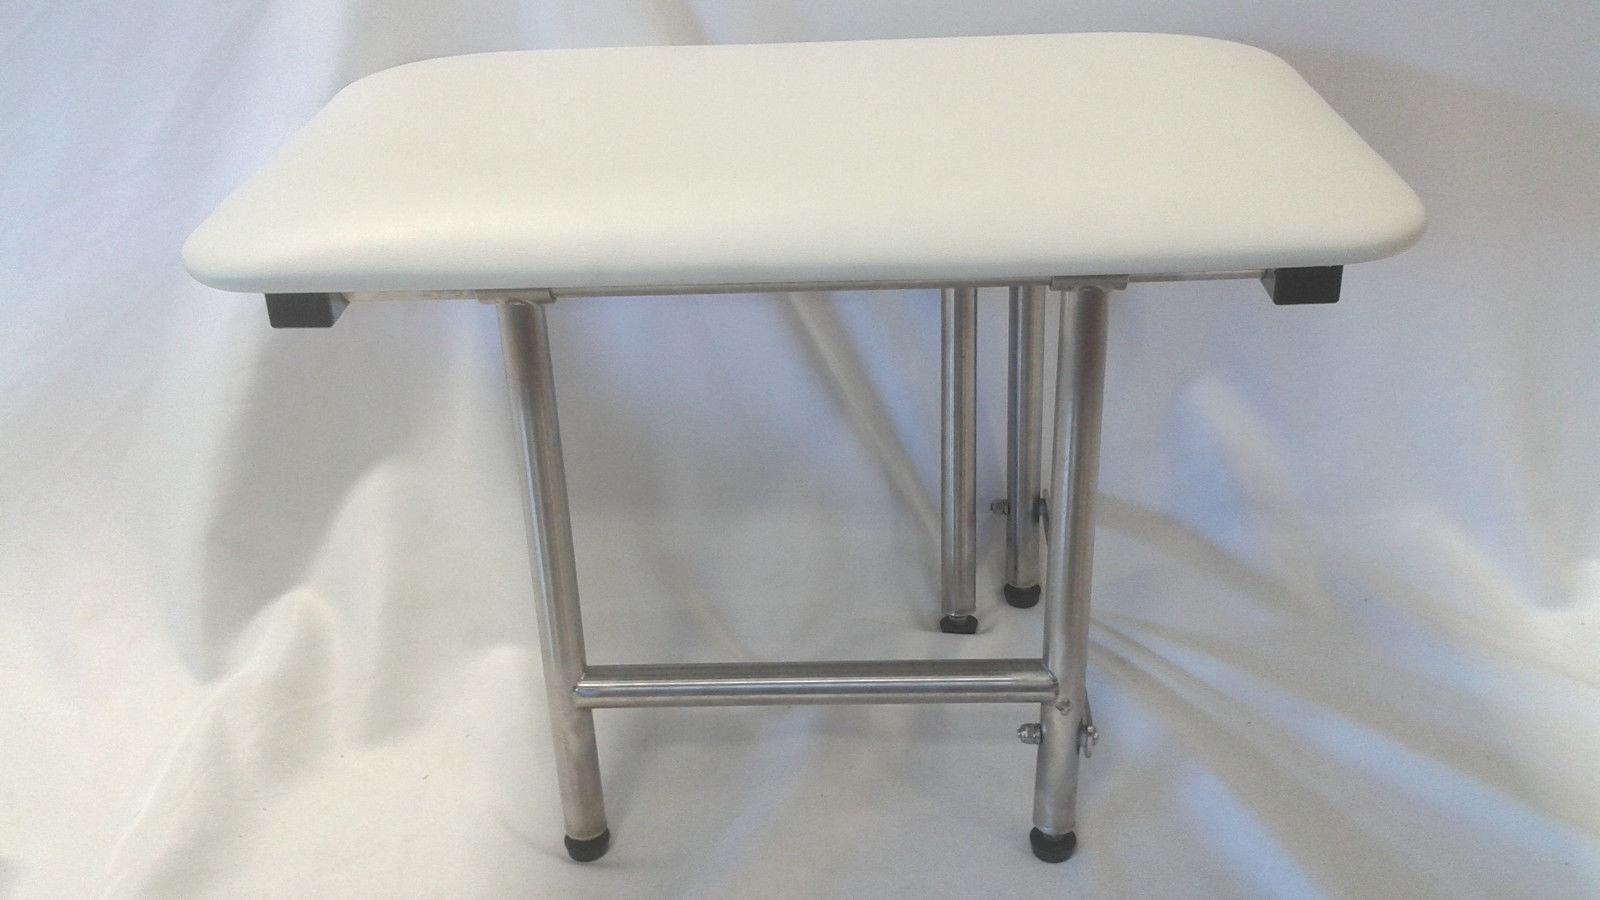 Praxis Bathtub Shower Bench Seat With 4 Legs 24\